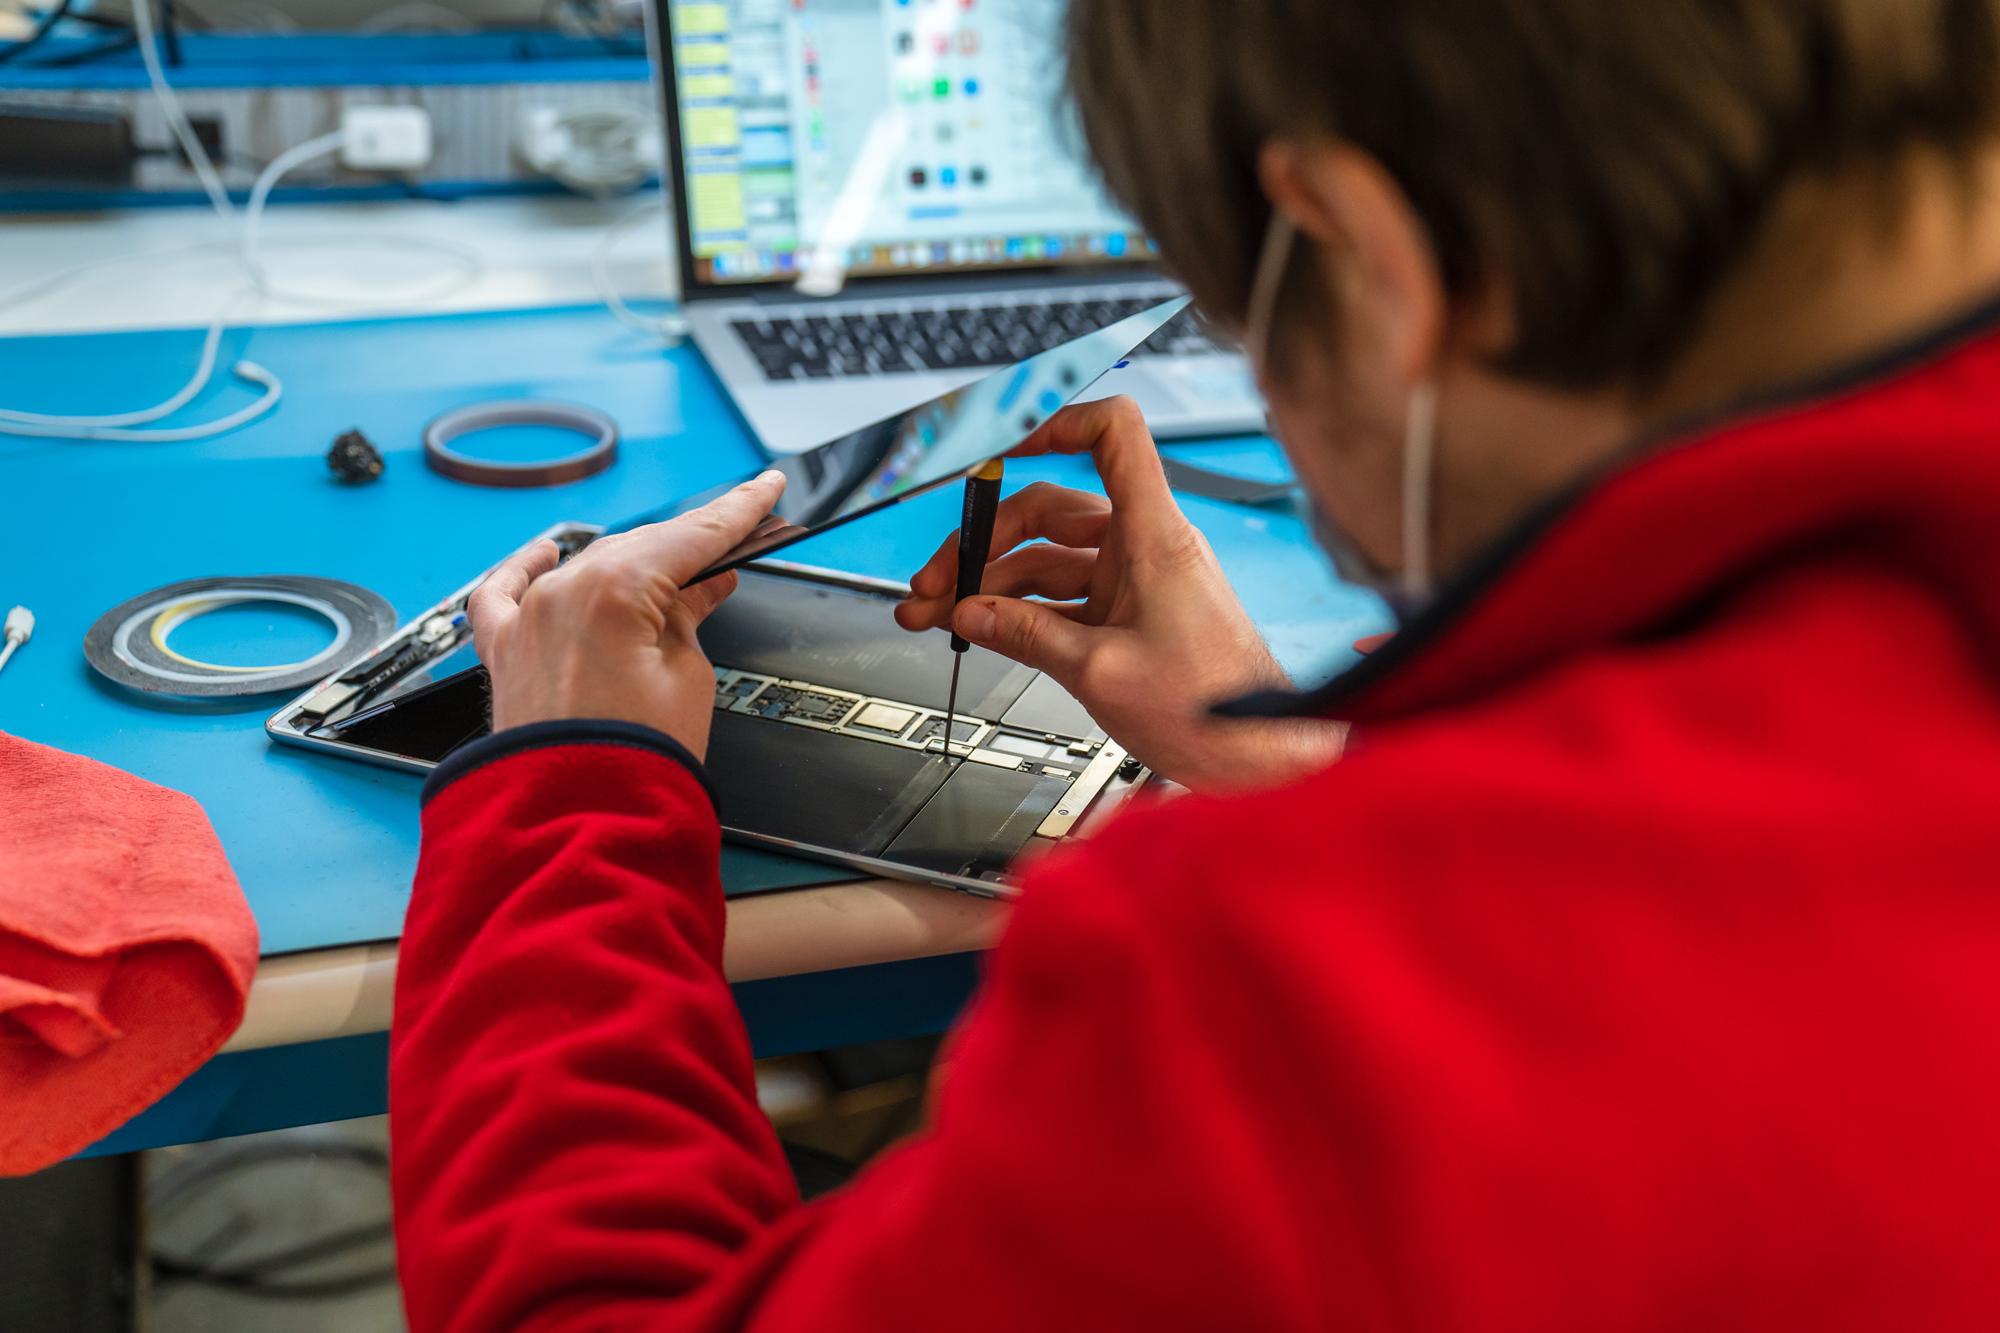 iResQ employee repairing a tablet